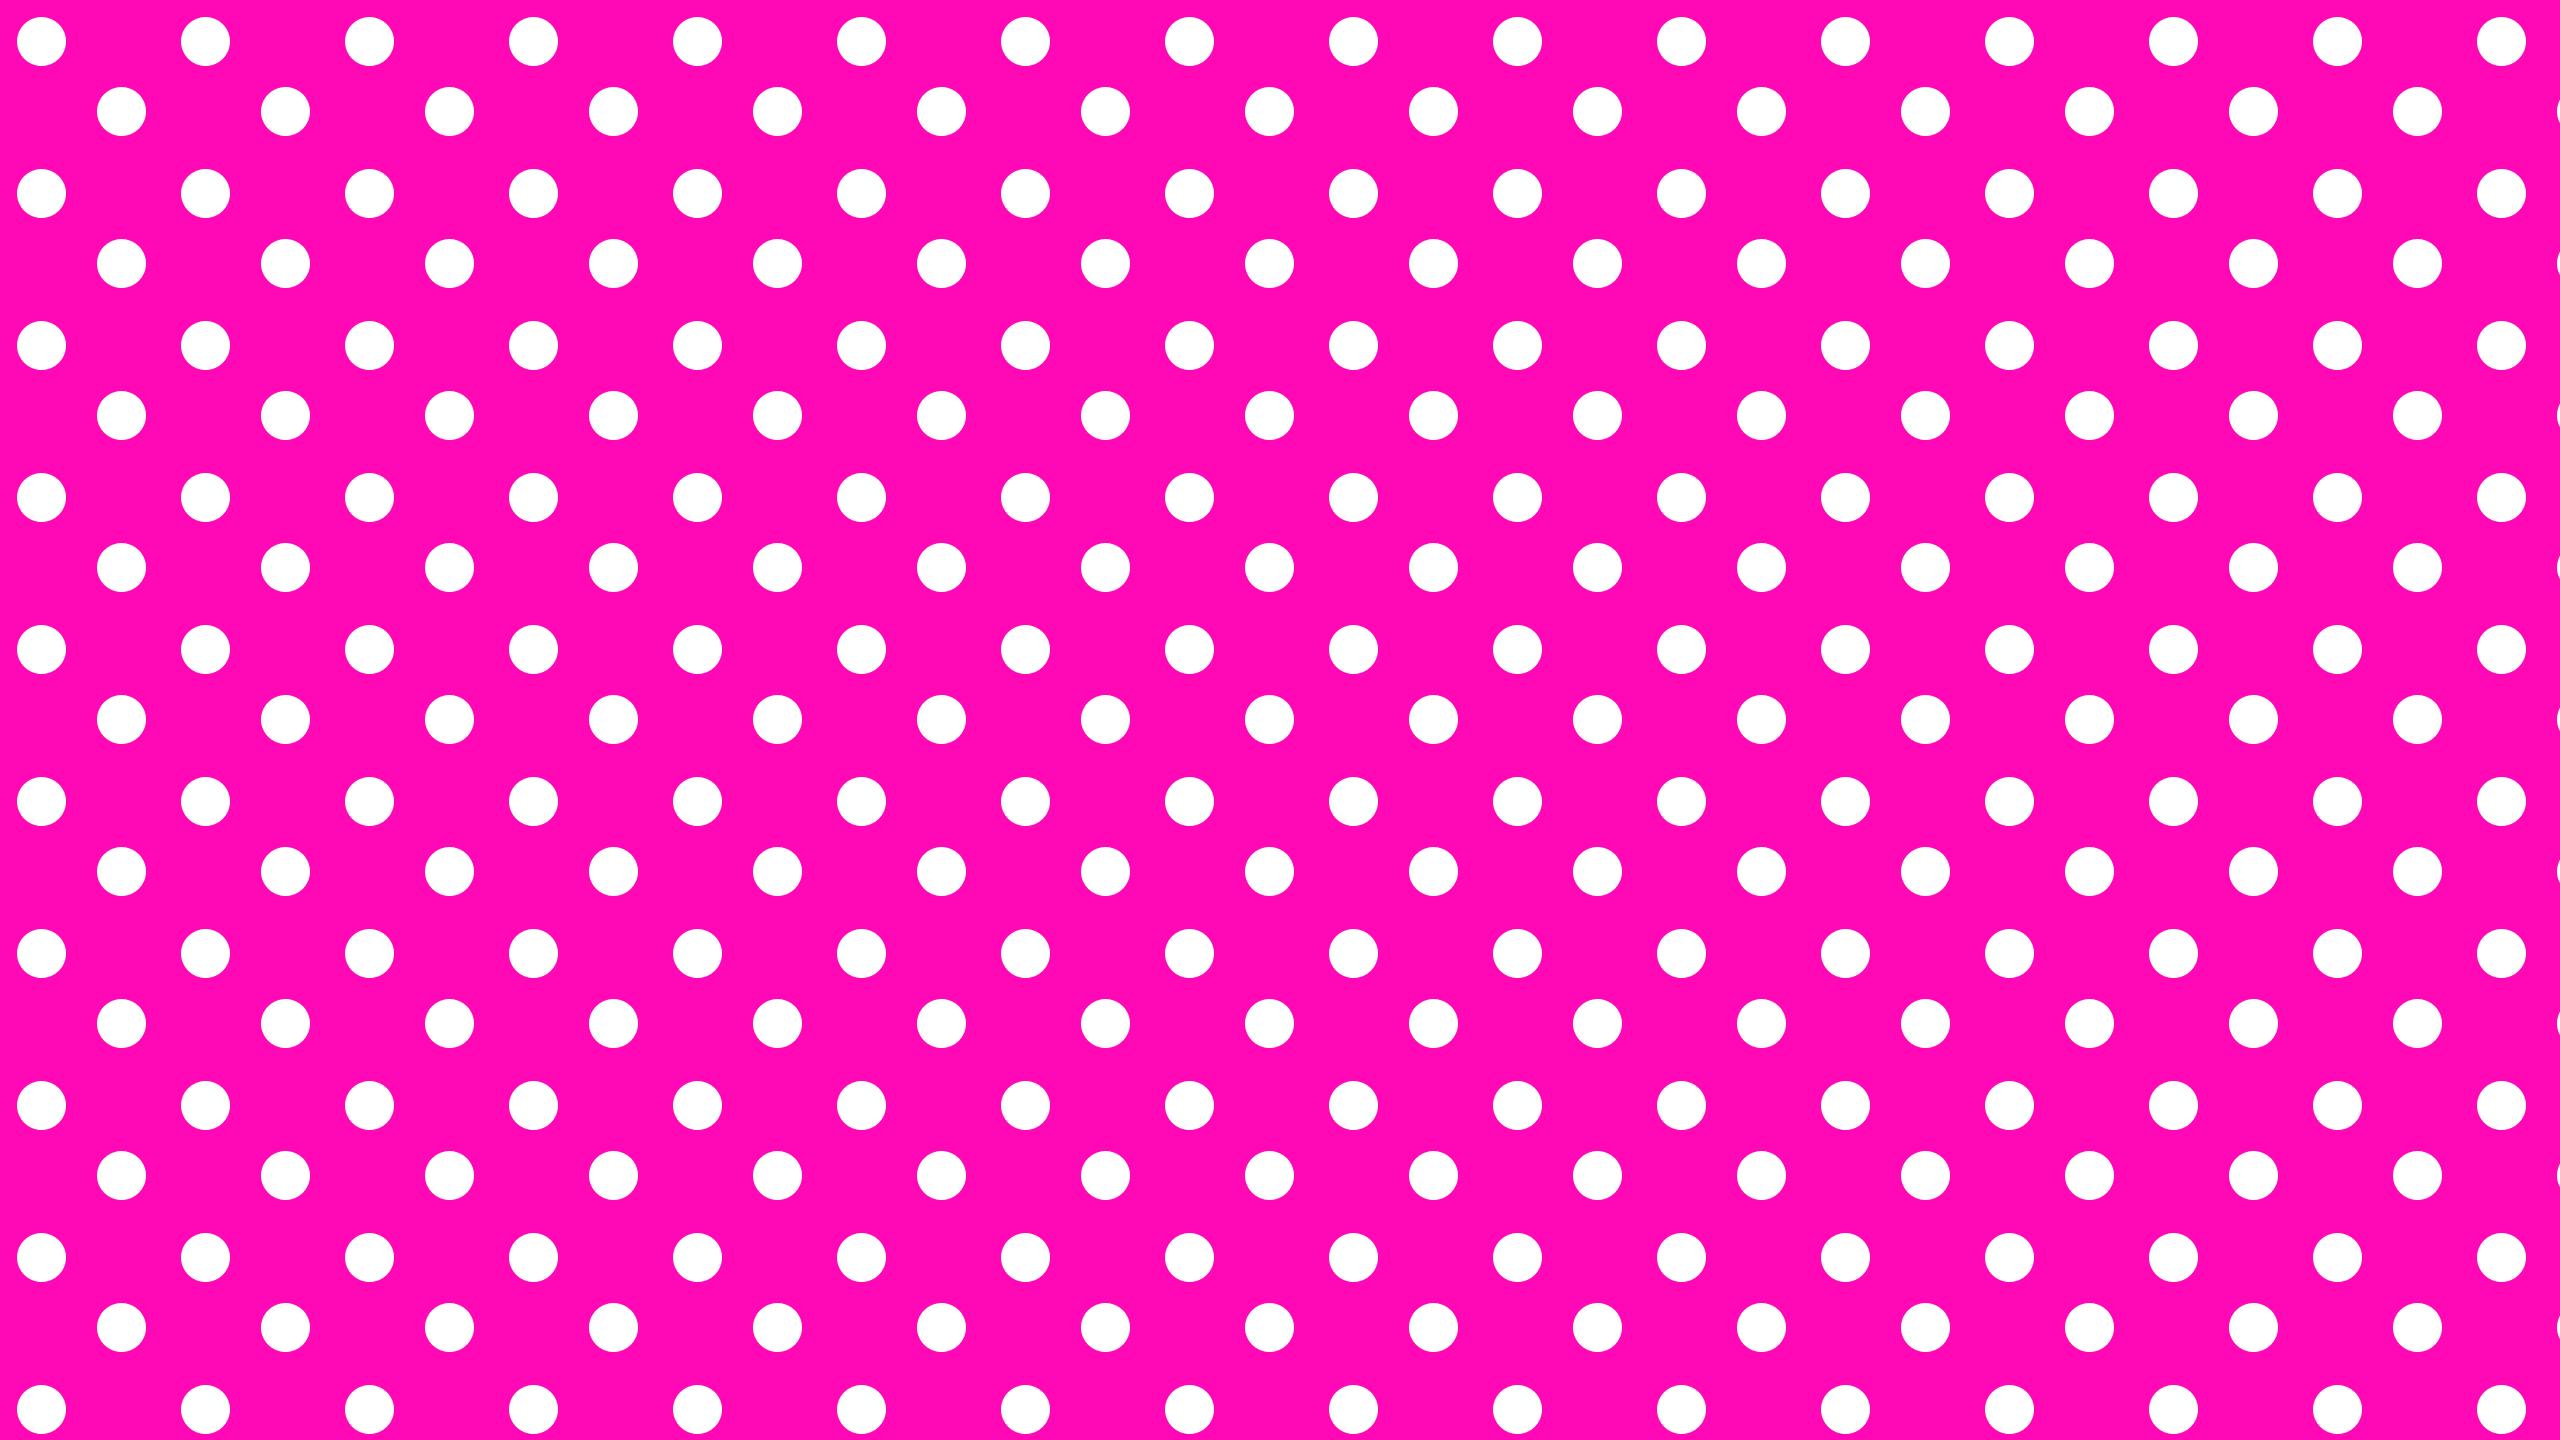 White Polka Dot Wallpaper - WallpaperSafari